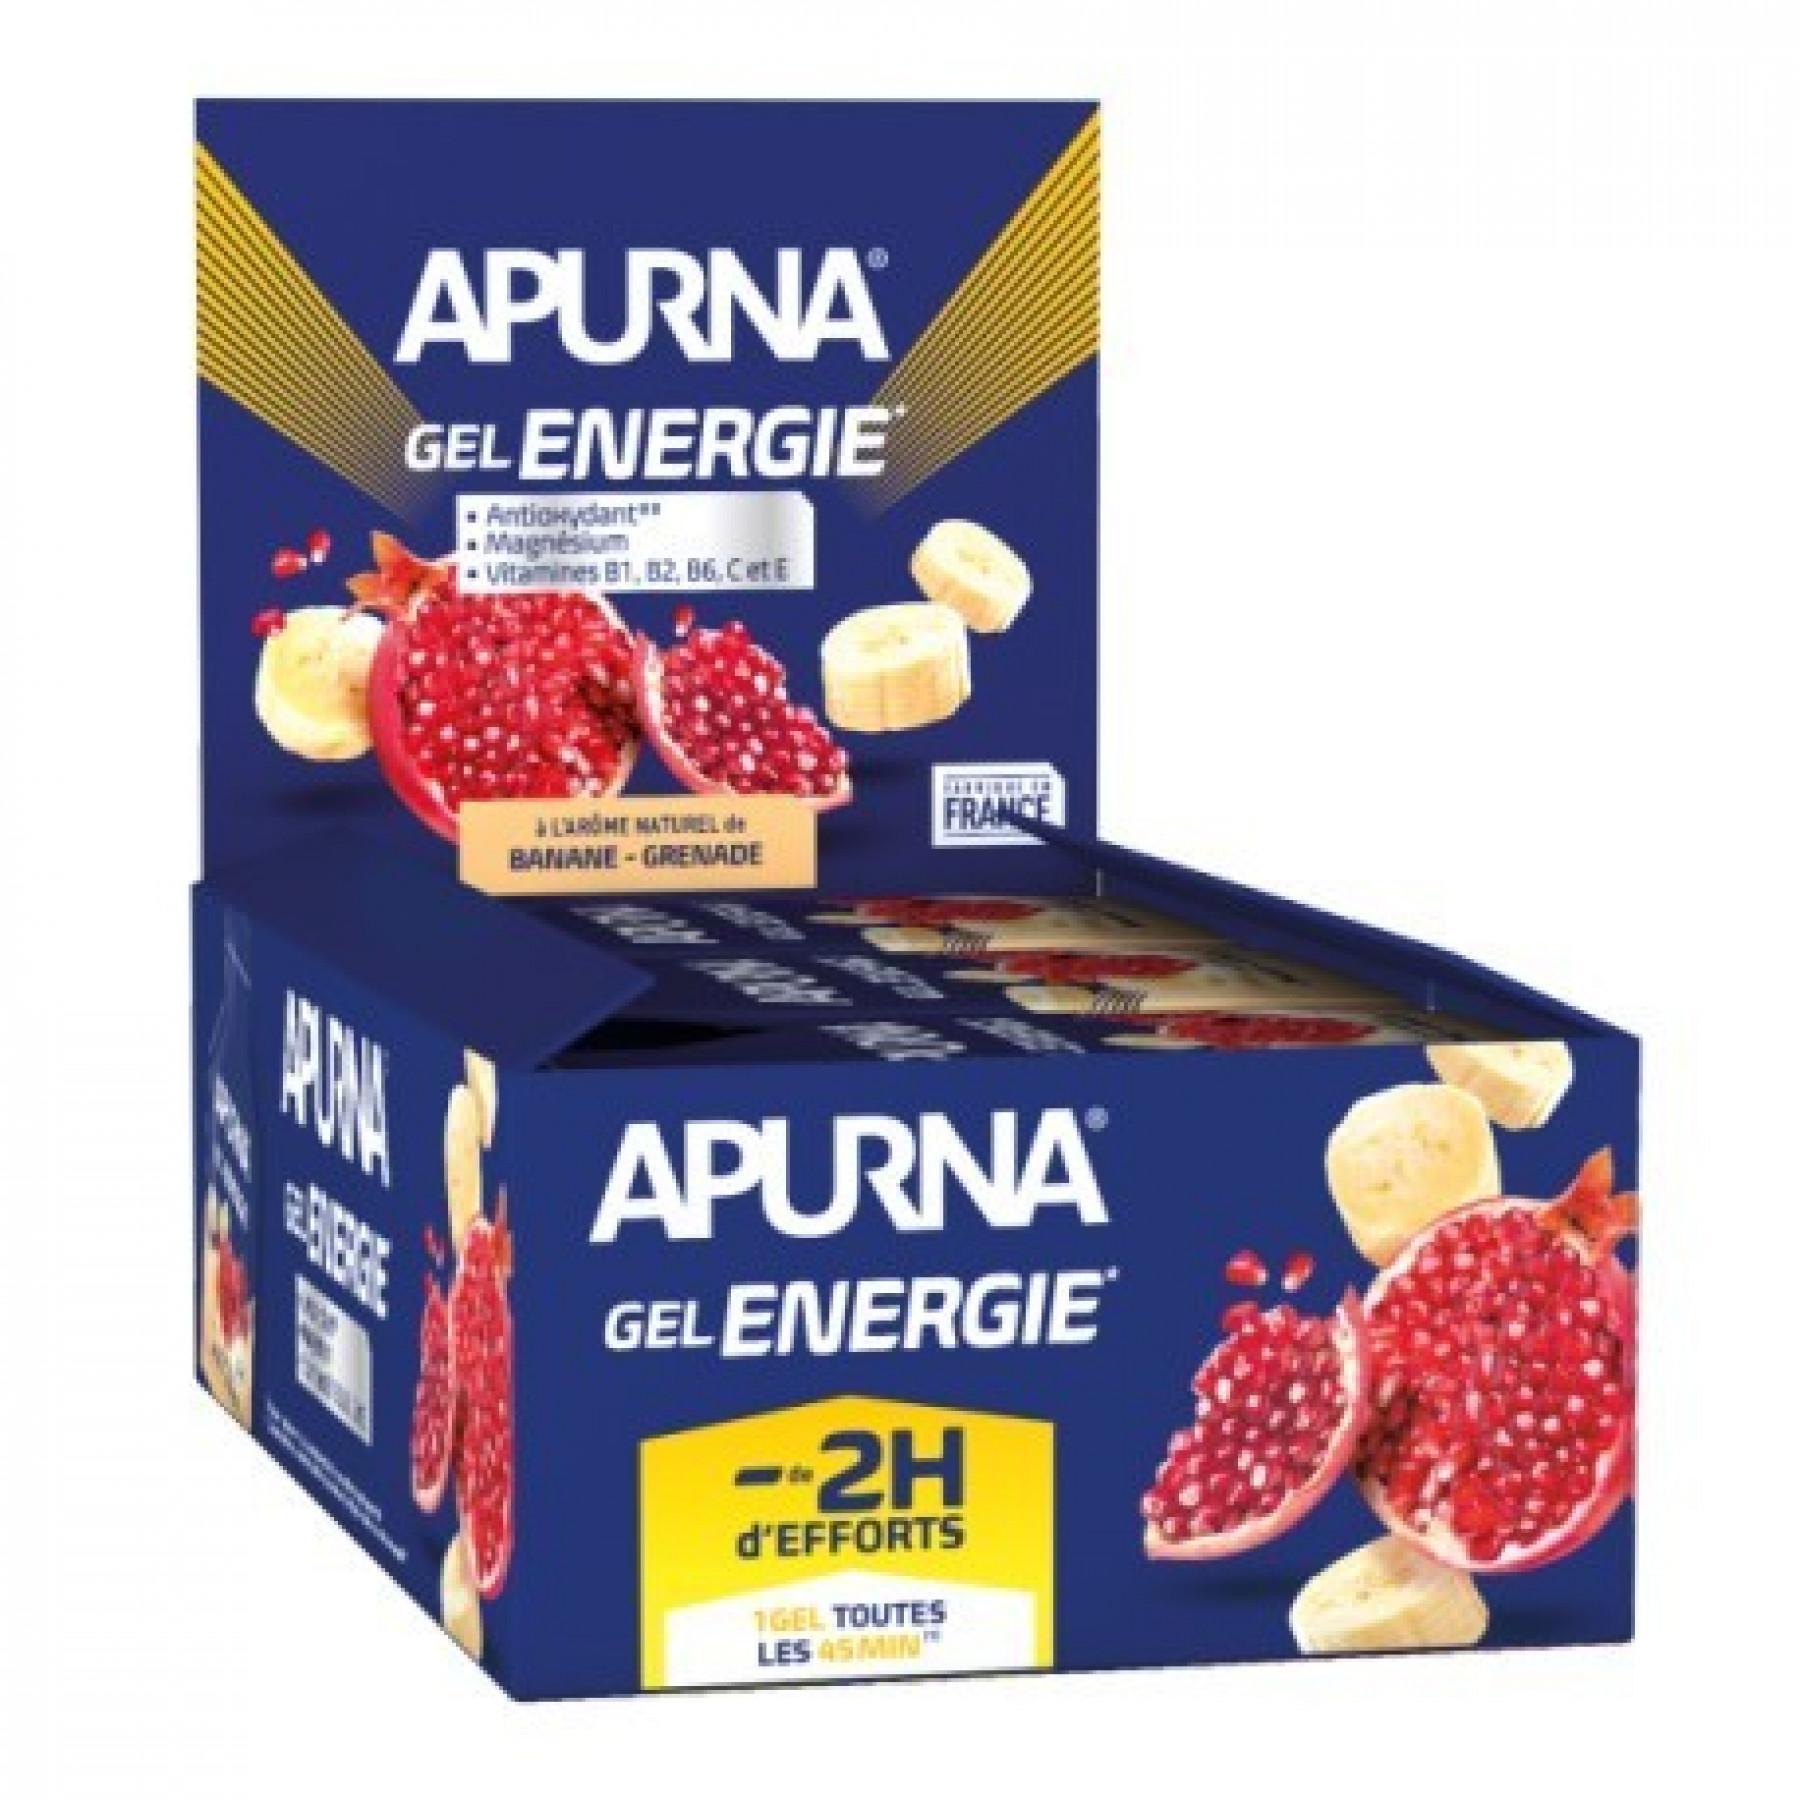 Lot of 24 gels Apurna Energy banana grenade - 35g